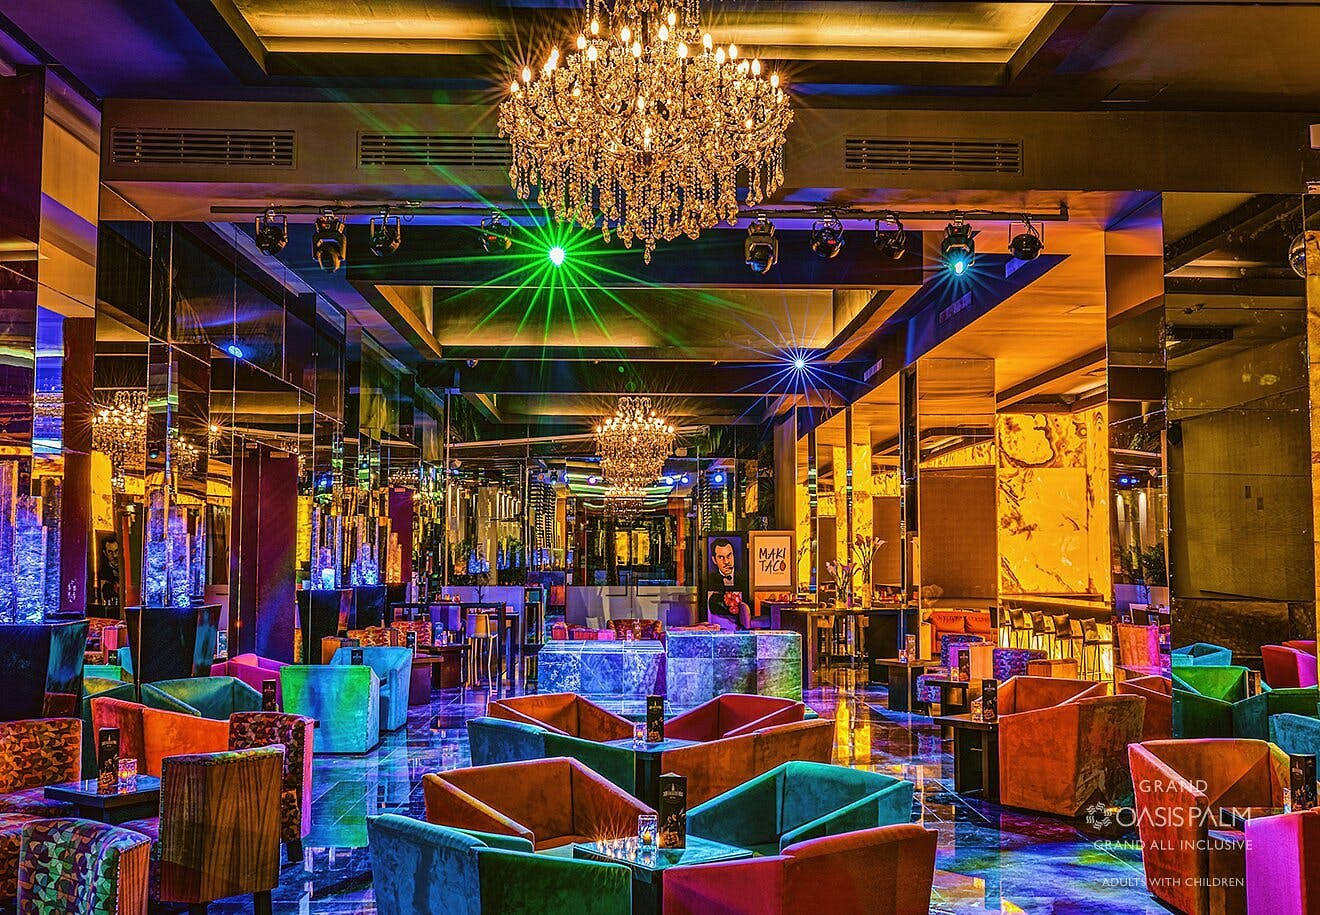 Oasis Palm bar